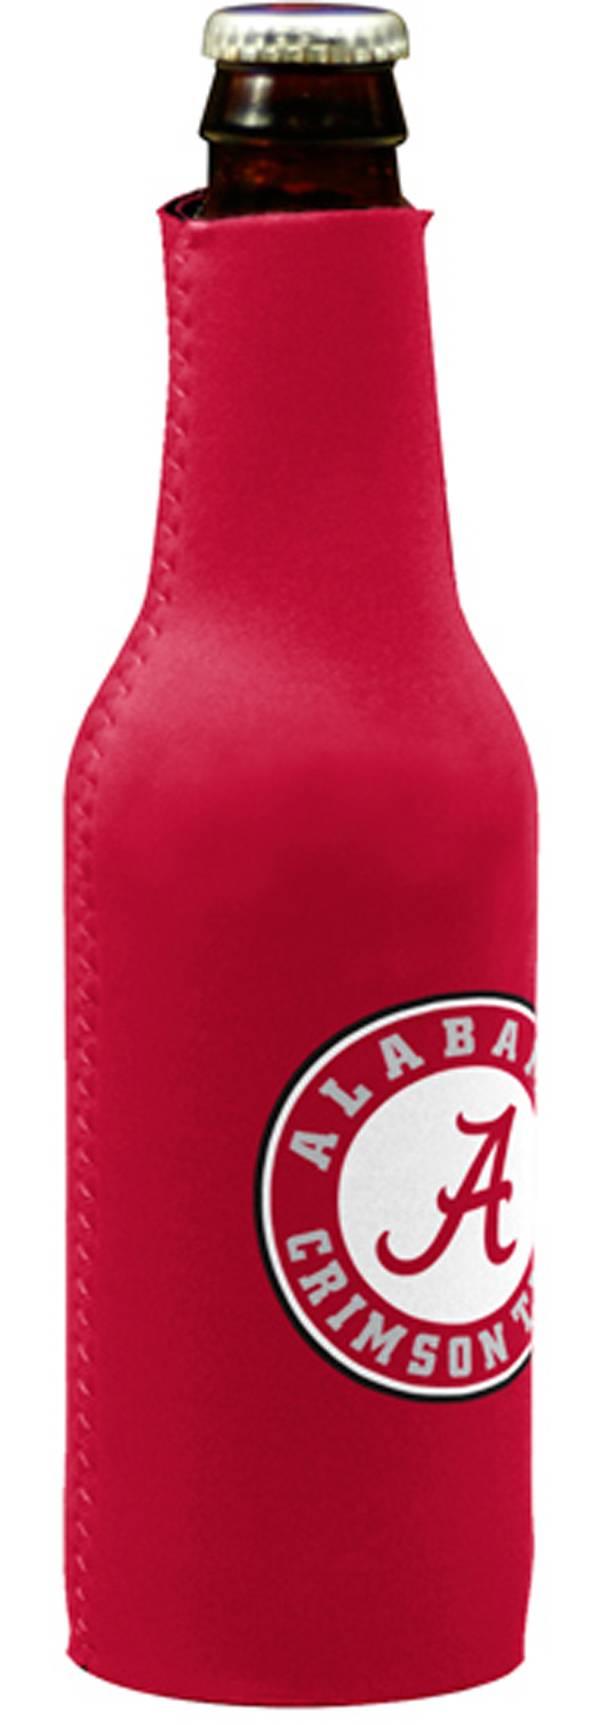 Alabama Crimson Tide Bottle Koozie product image